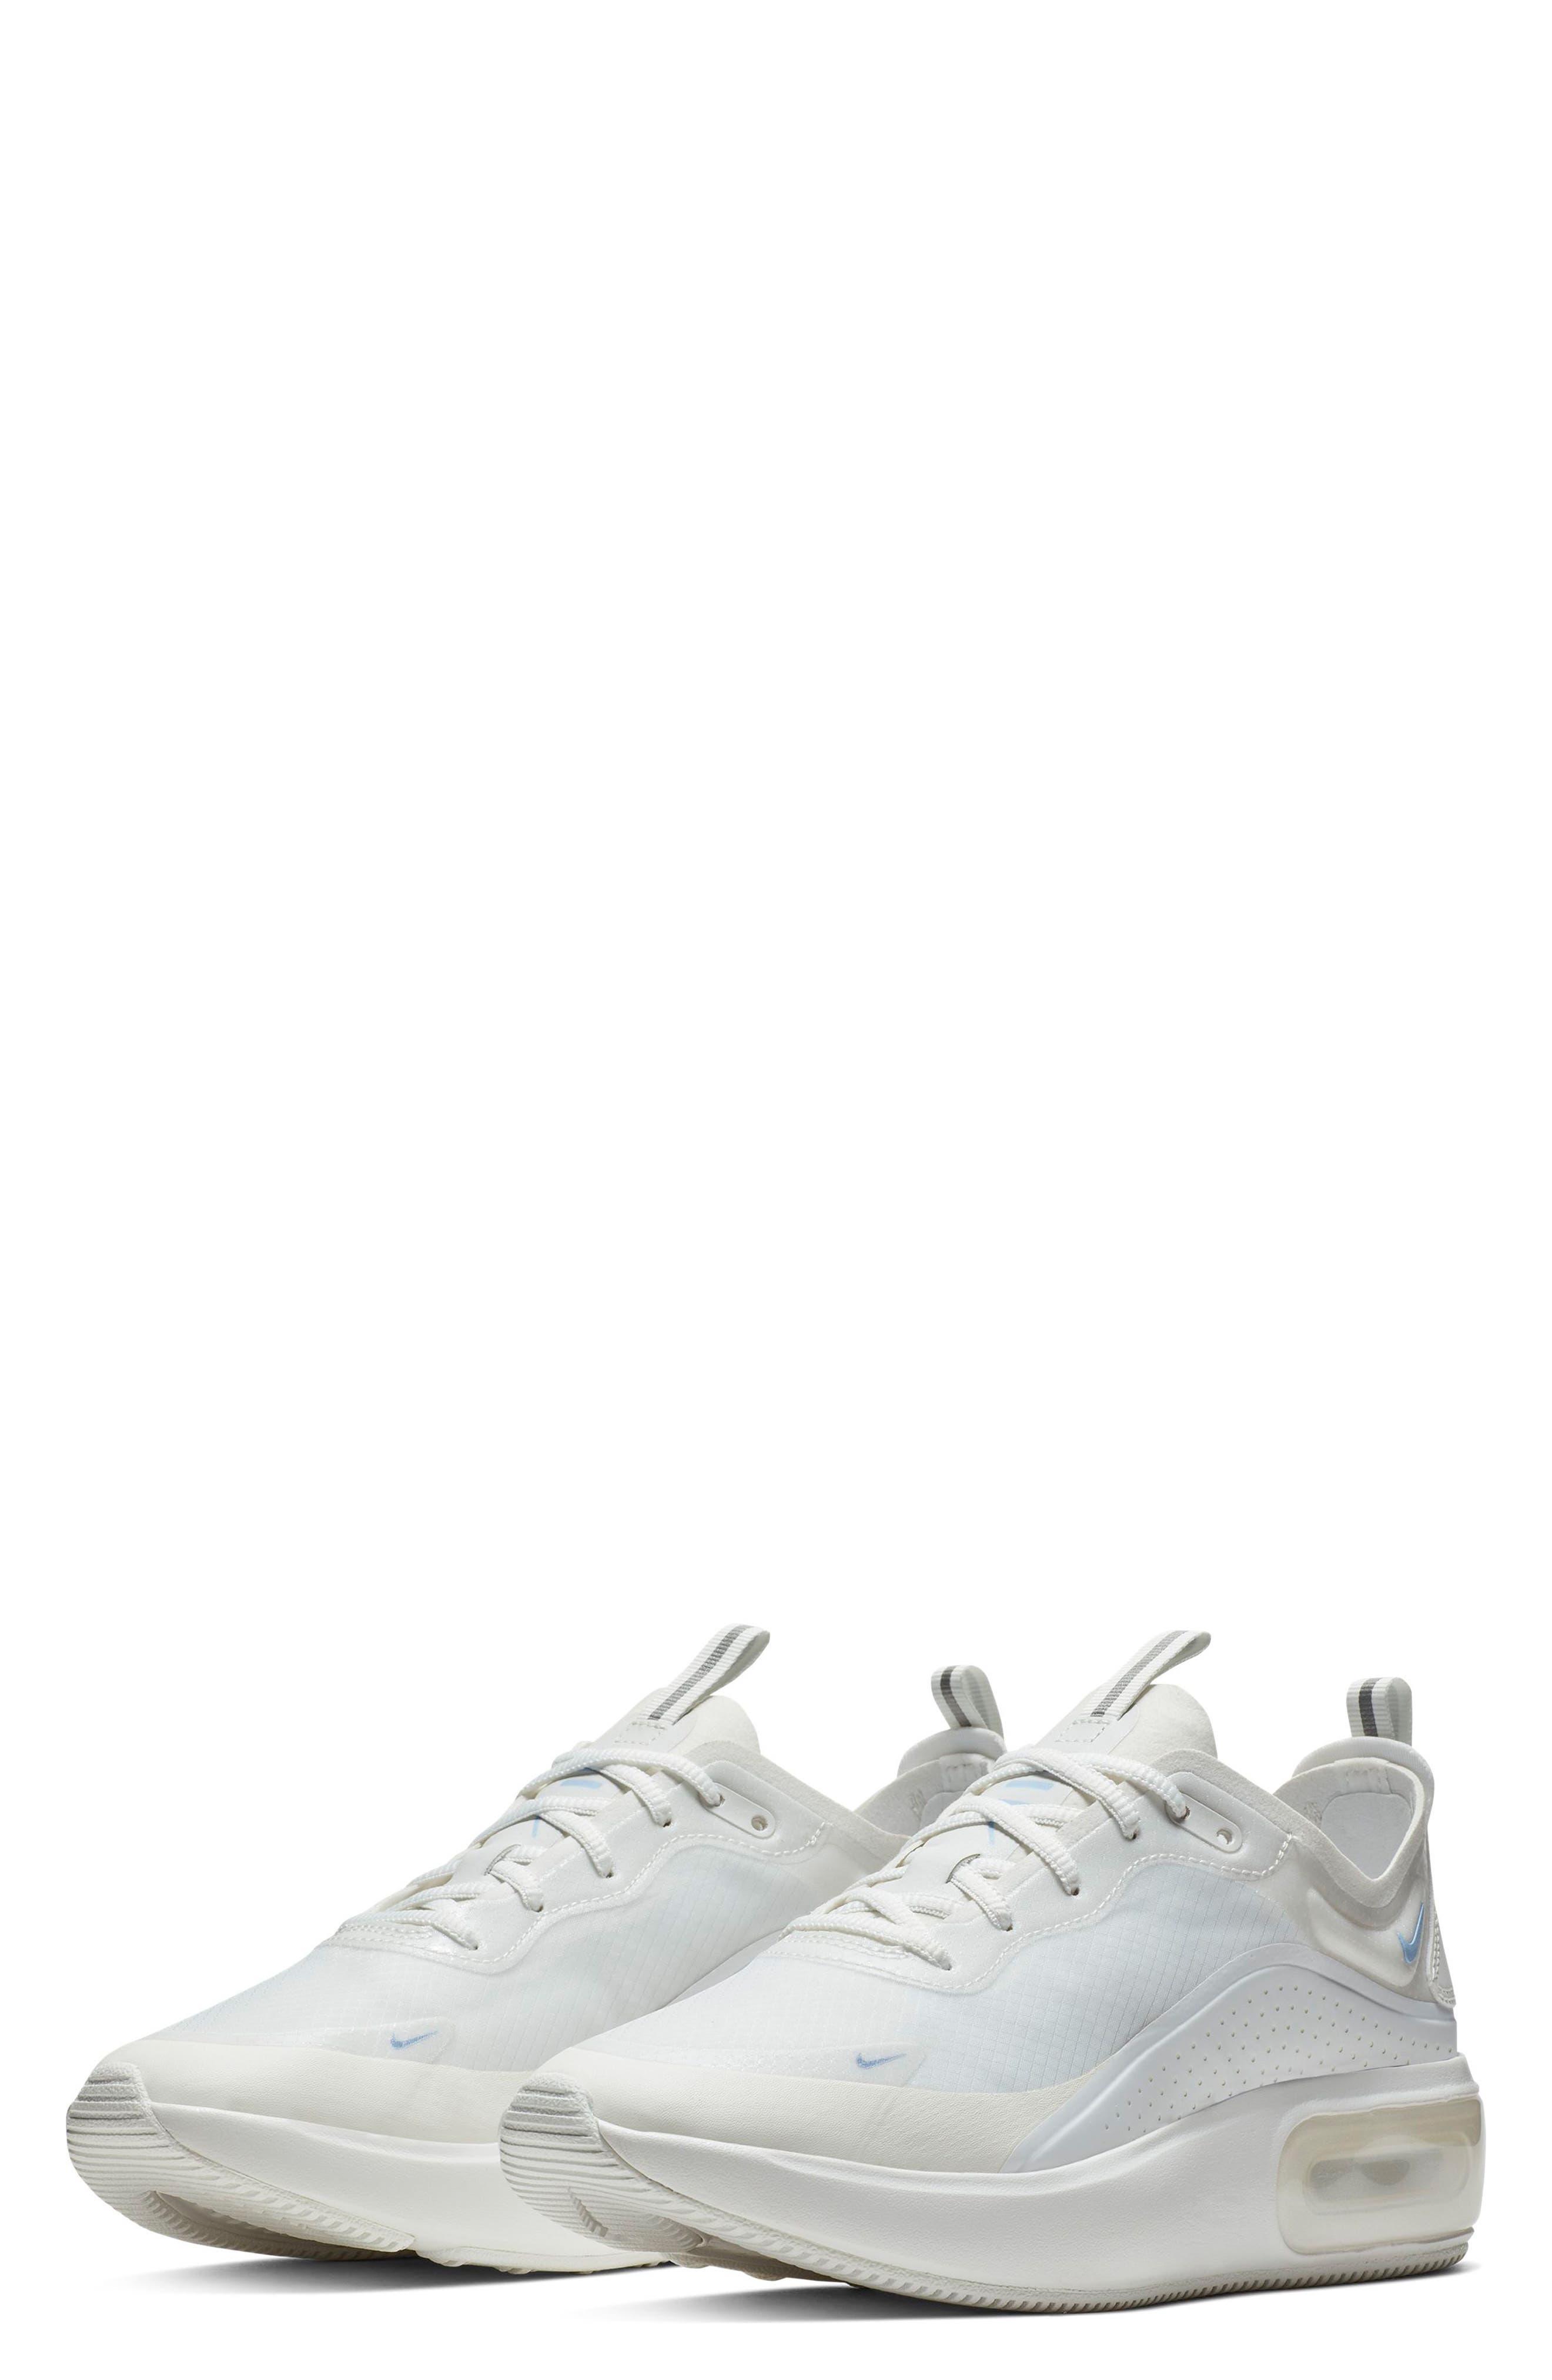 NIKE Air Max DIA SE Running Shoe, Main, color, WHITE/ ALUMINUM/ WHITE